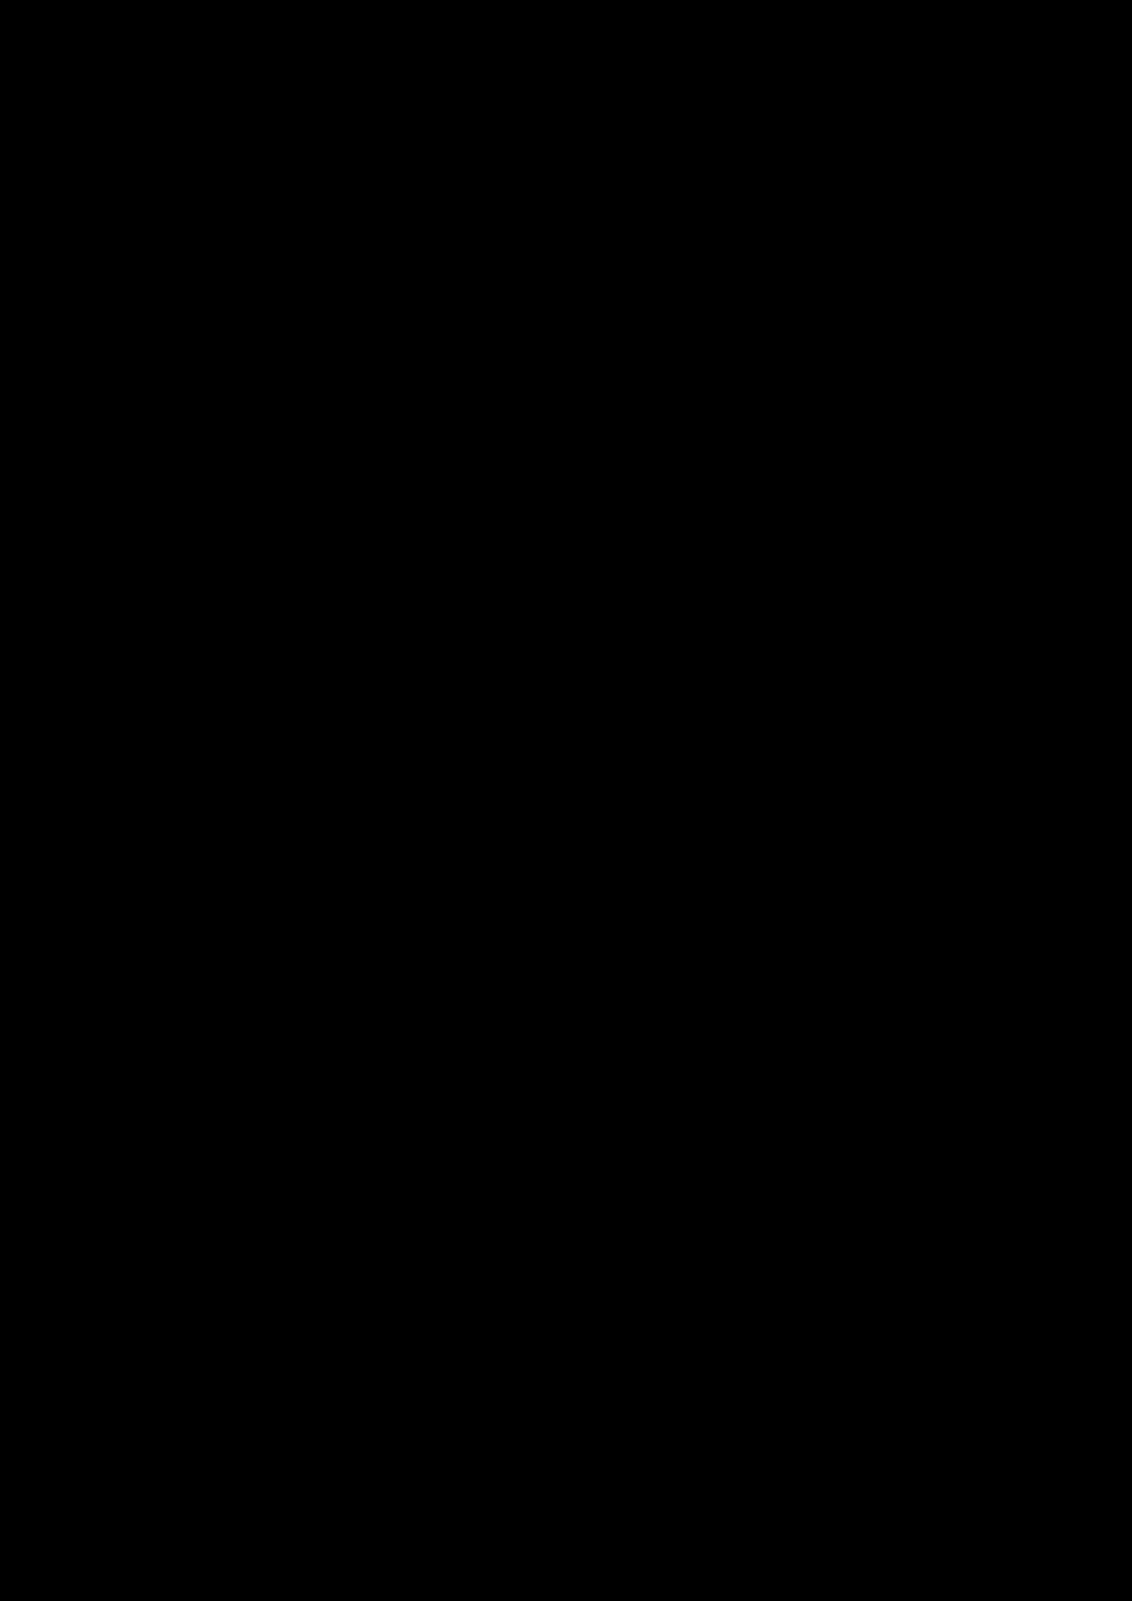 Ot Bolshogo Uma slide, Image 15